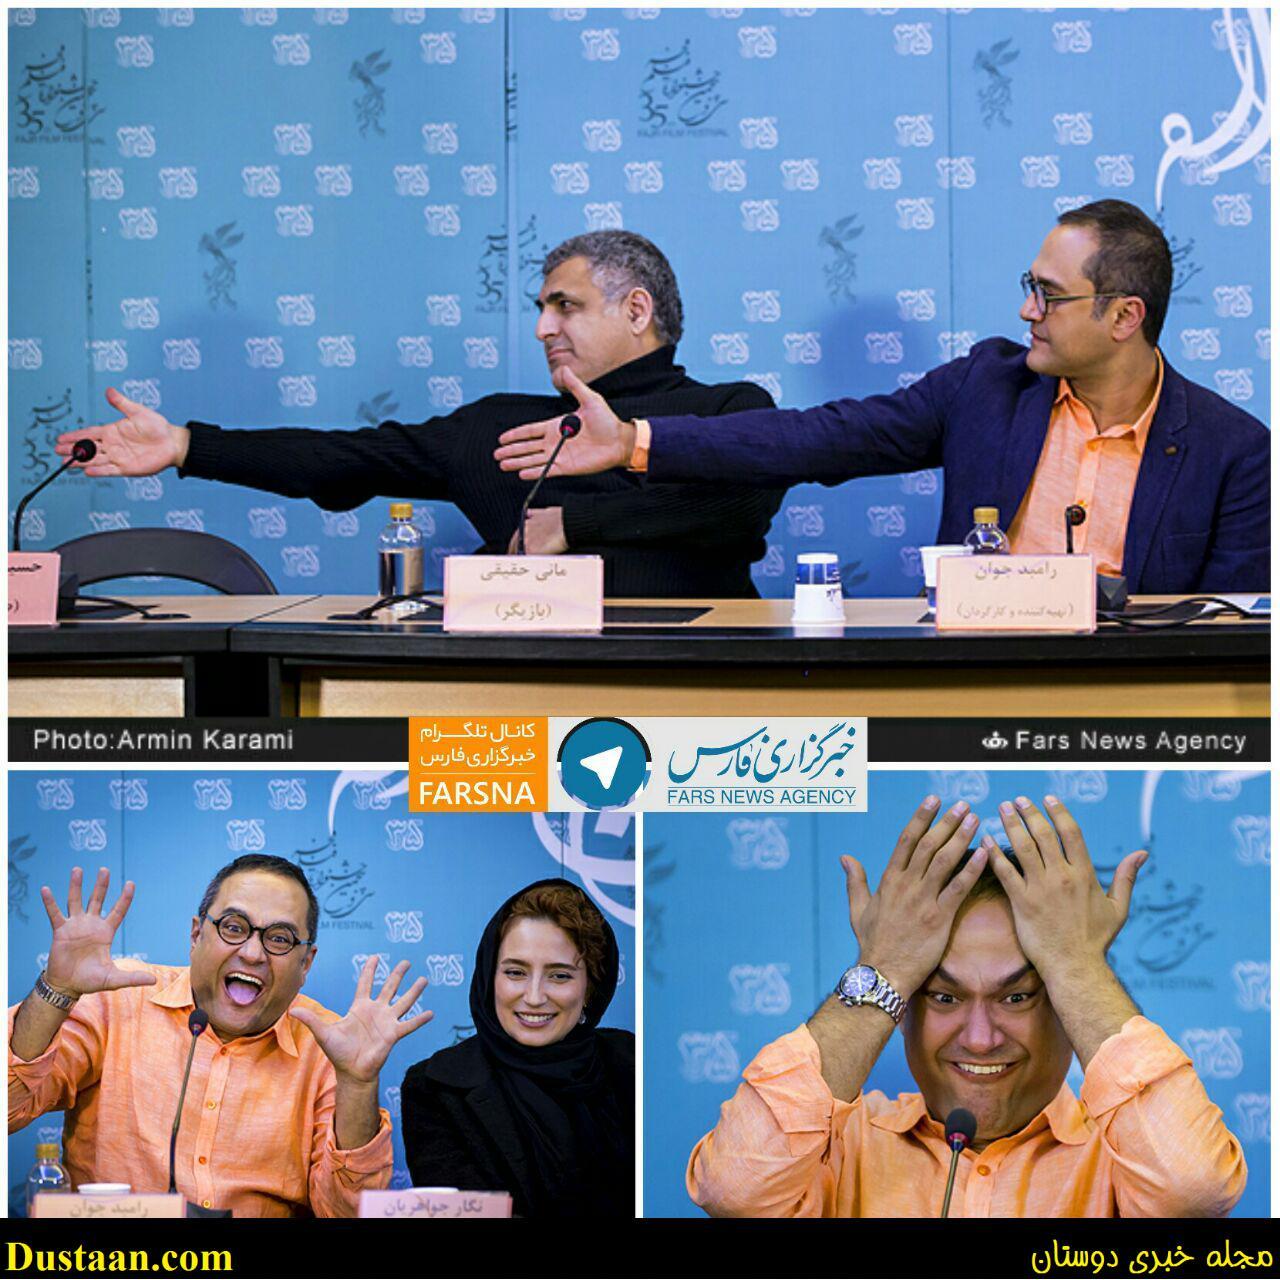 www.dustaan.com حرکت های عجیب «رامبد جوان» در کنار همسرش، نگار جواهریان! +تصاویر